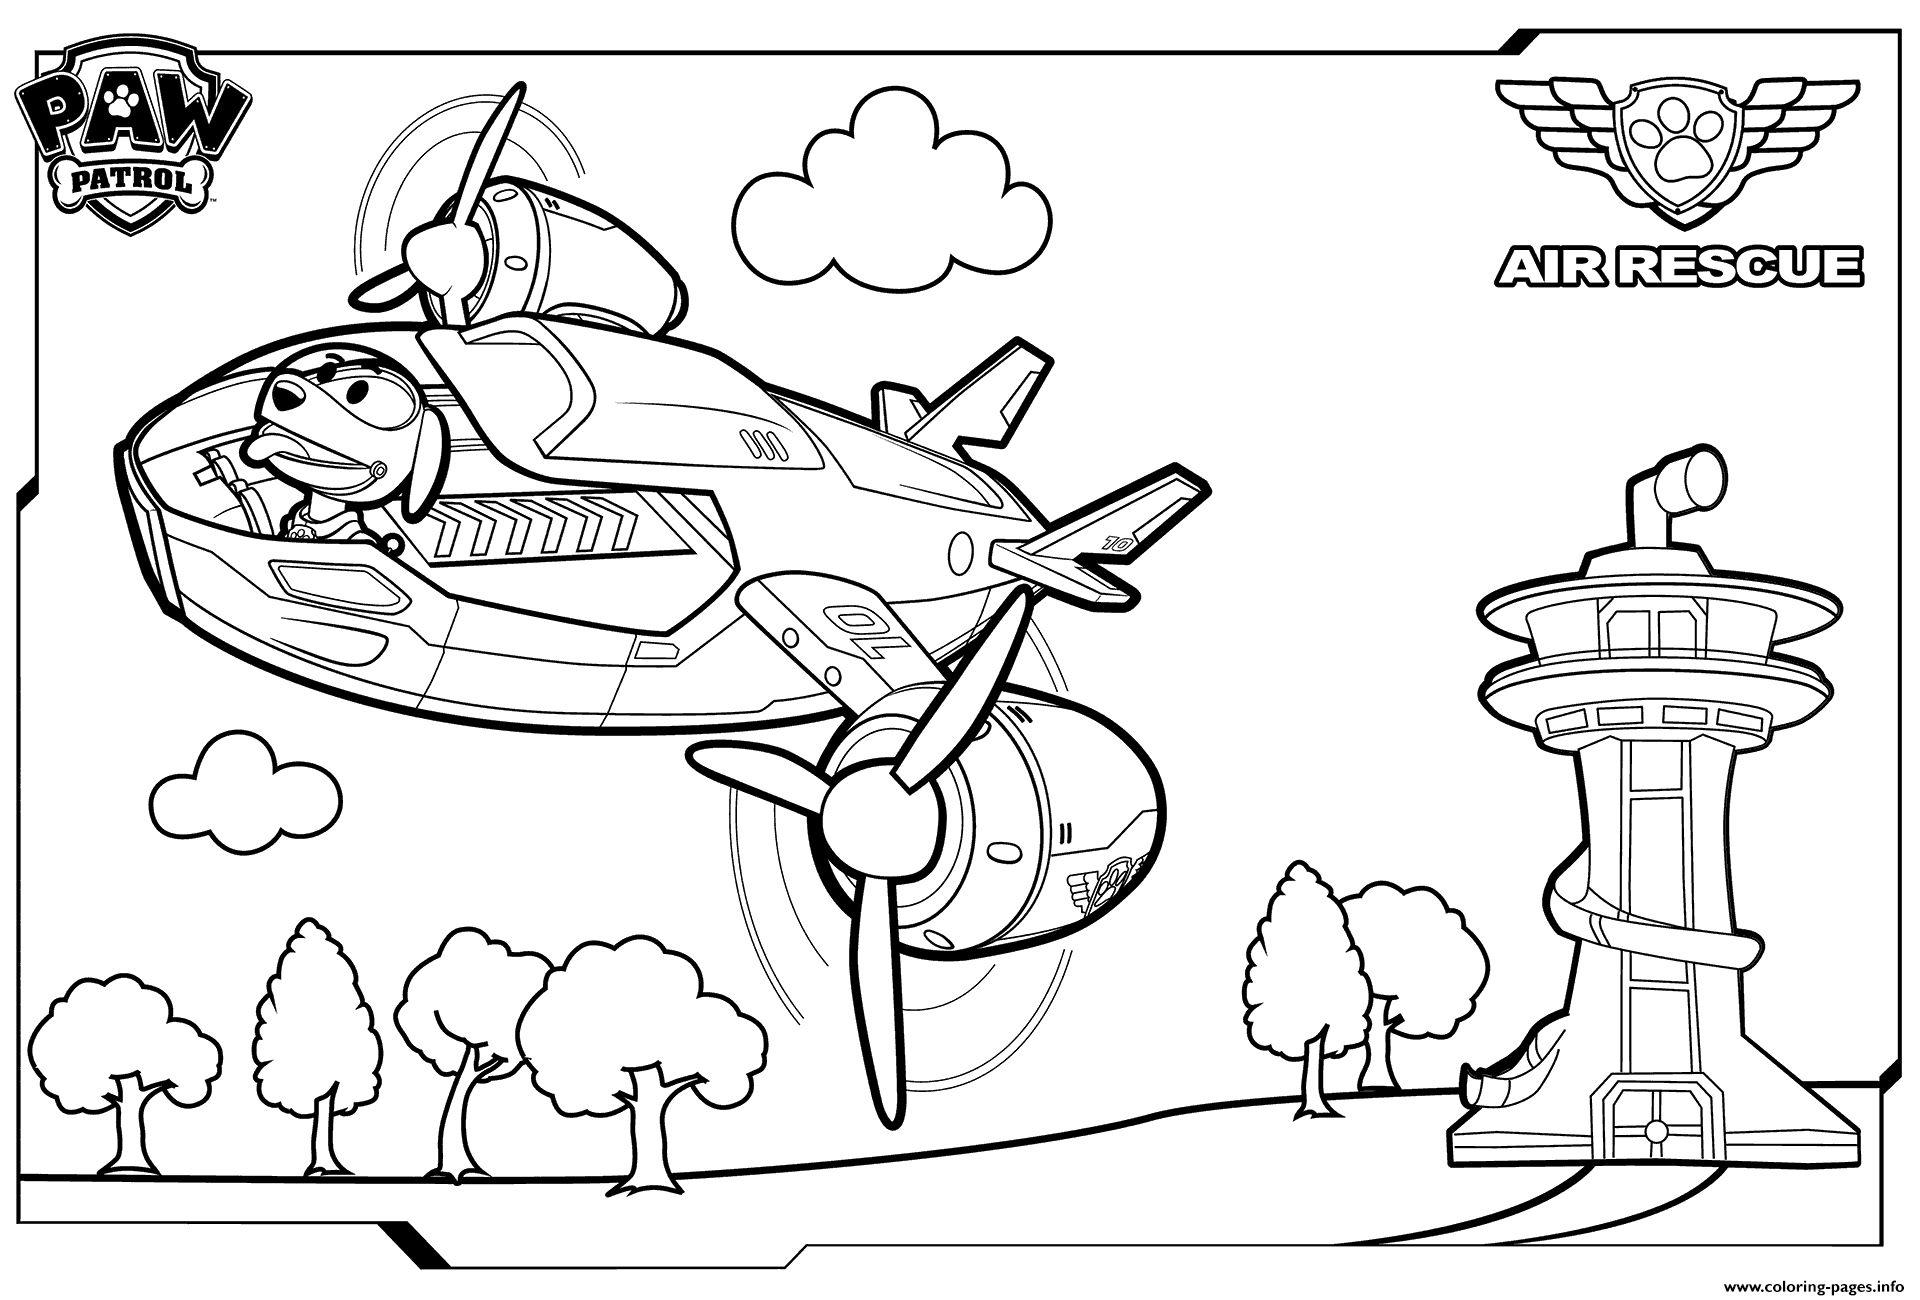 Paw Patrol Coloring Pages Paw Patrol Air Patroller Coloring Coloring Pages Printable Albanysinsanity Com Desenhos